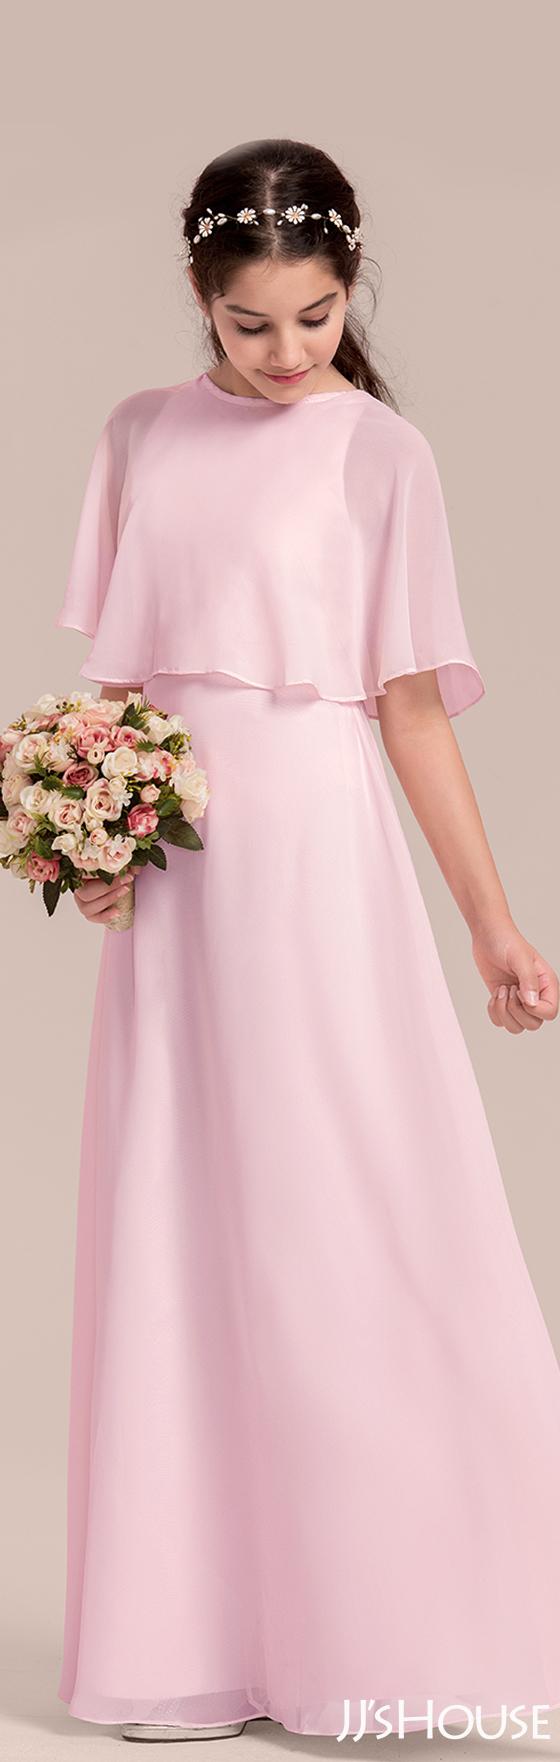 cc38c697ce2 Such a gentle color and classic design of a junior bridesmaid dress!   JJsHouse  Junior  Bridesmaid